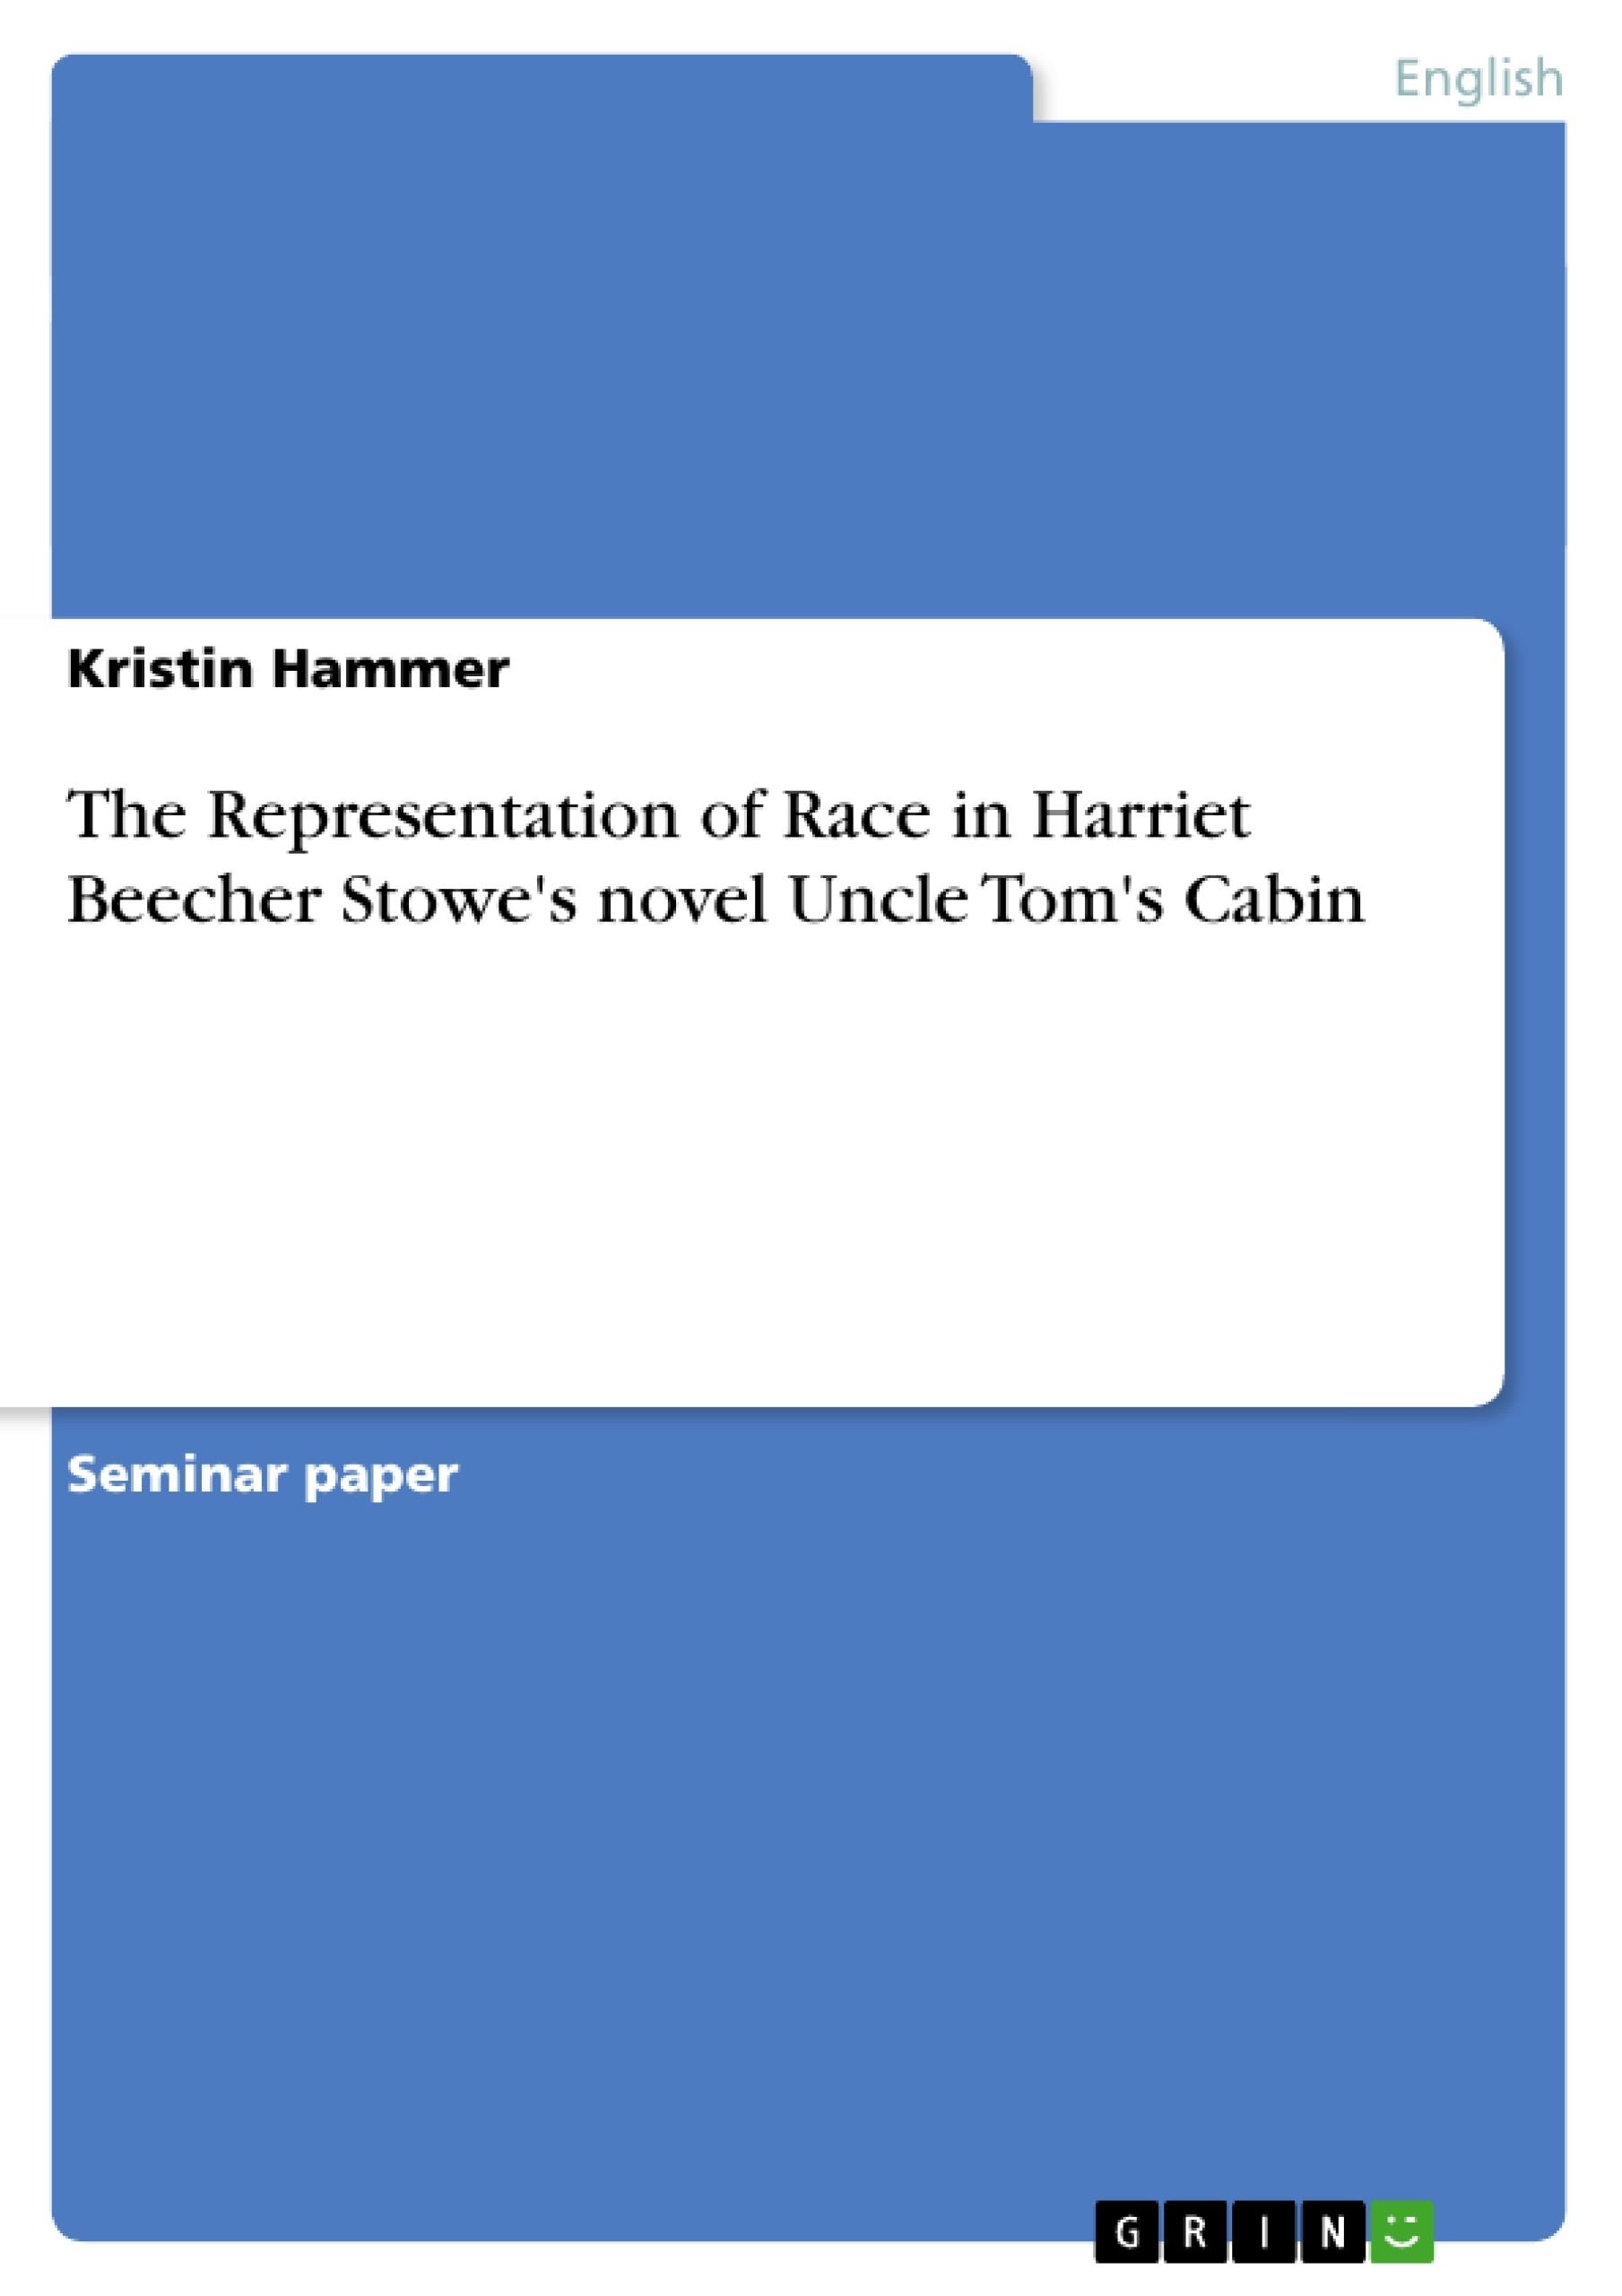 Title: The Representation of Race in Harriet Beecher Stowe's novel Uncle Tom's Cabin